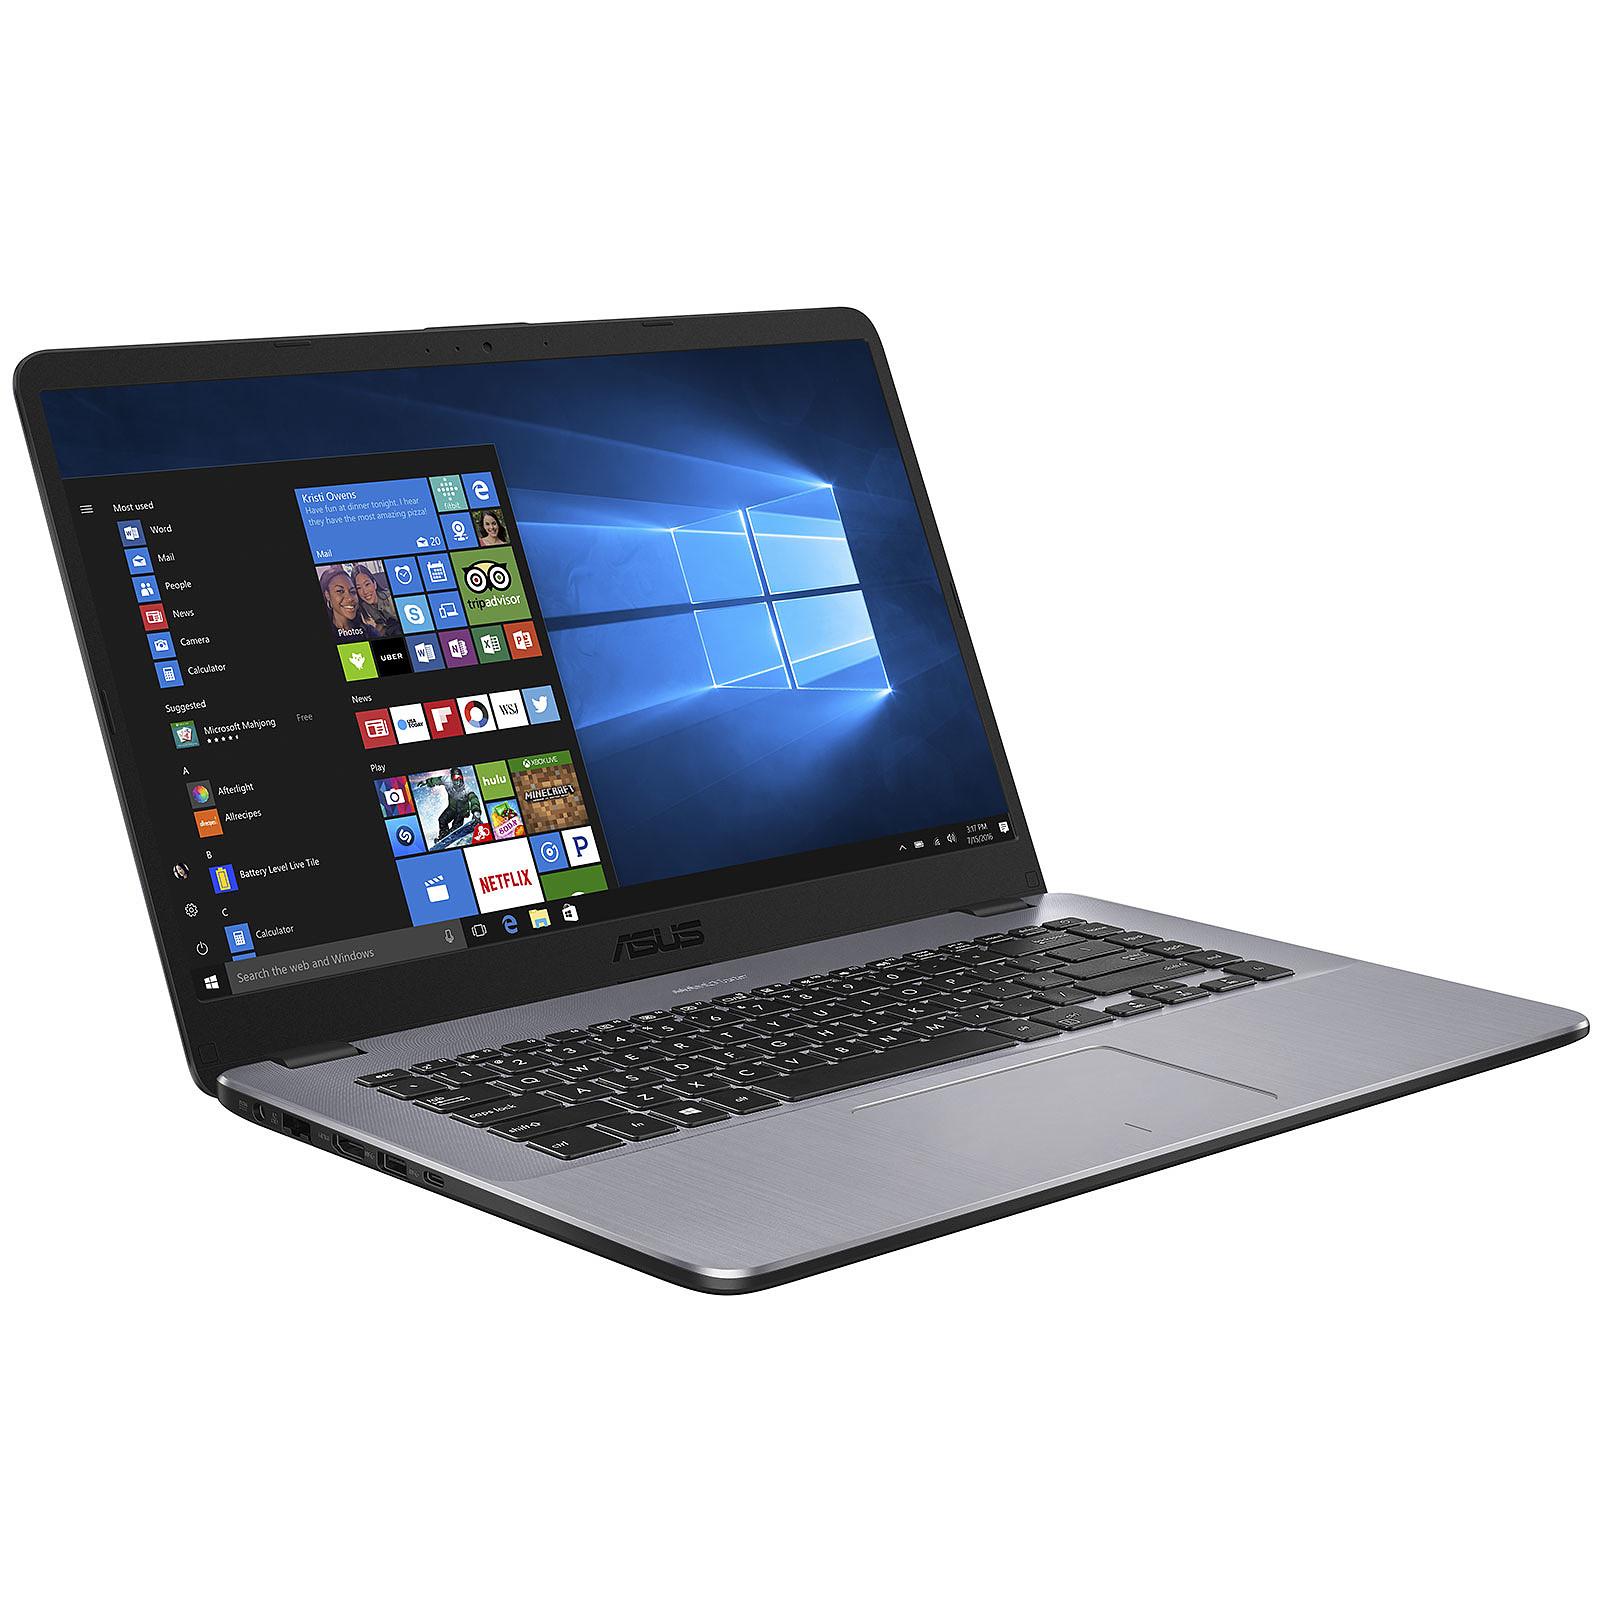 ASUS Vivobook S505BA-BR016T